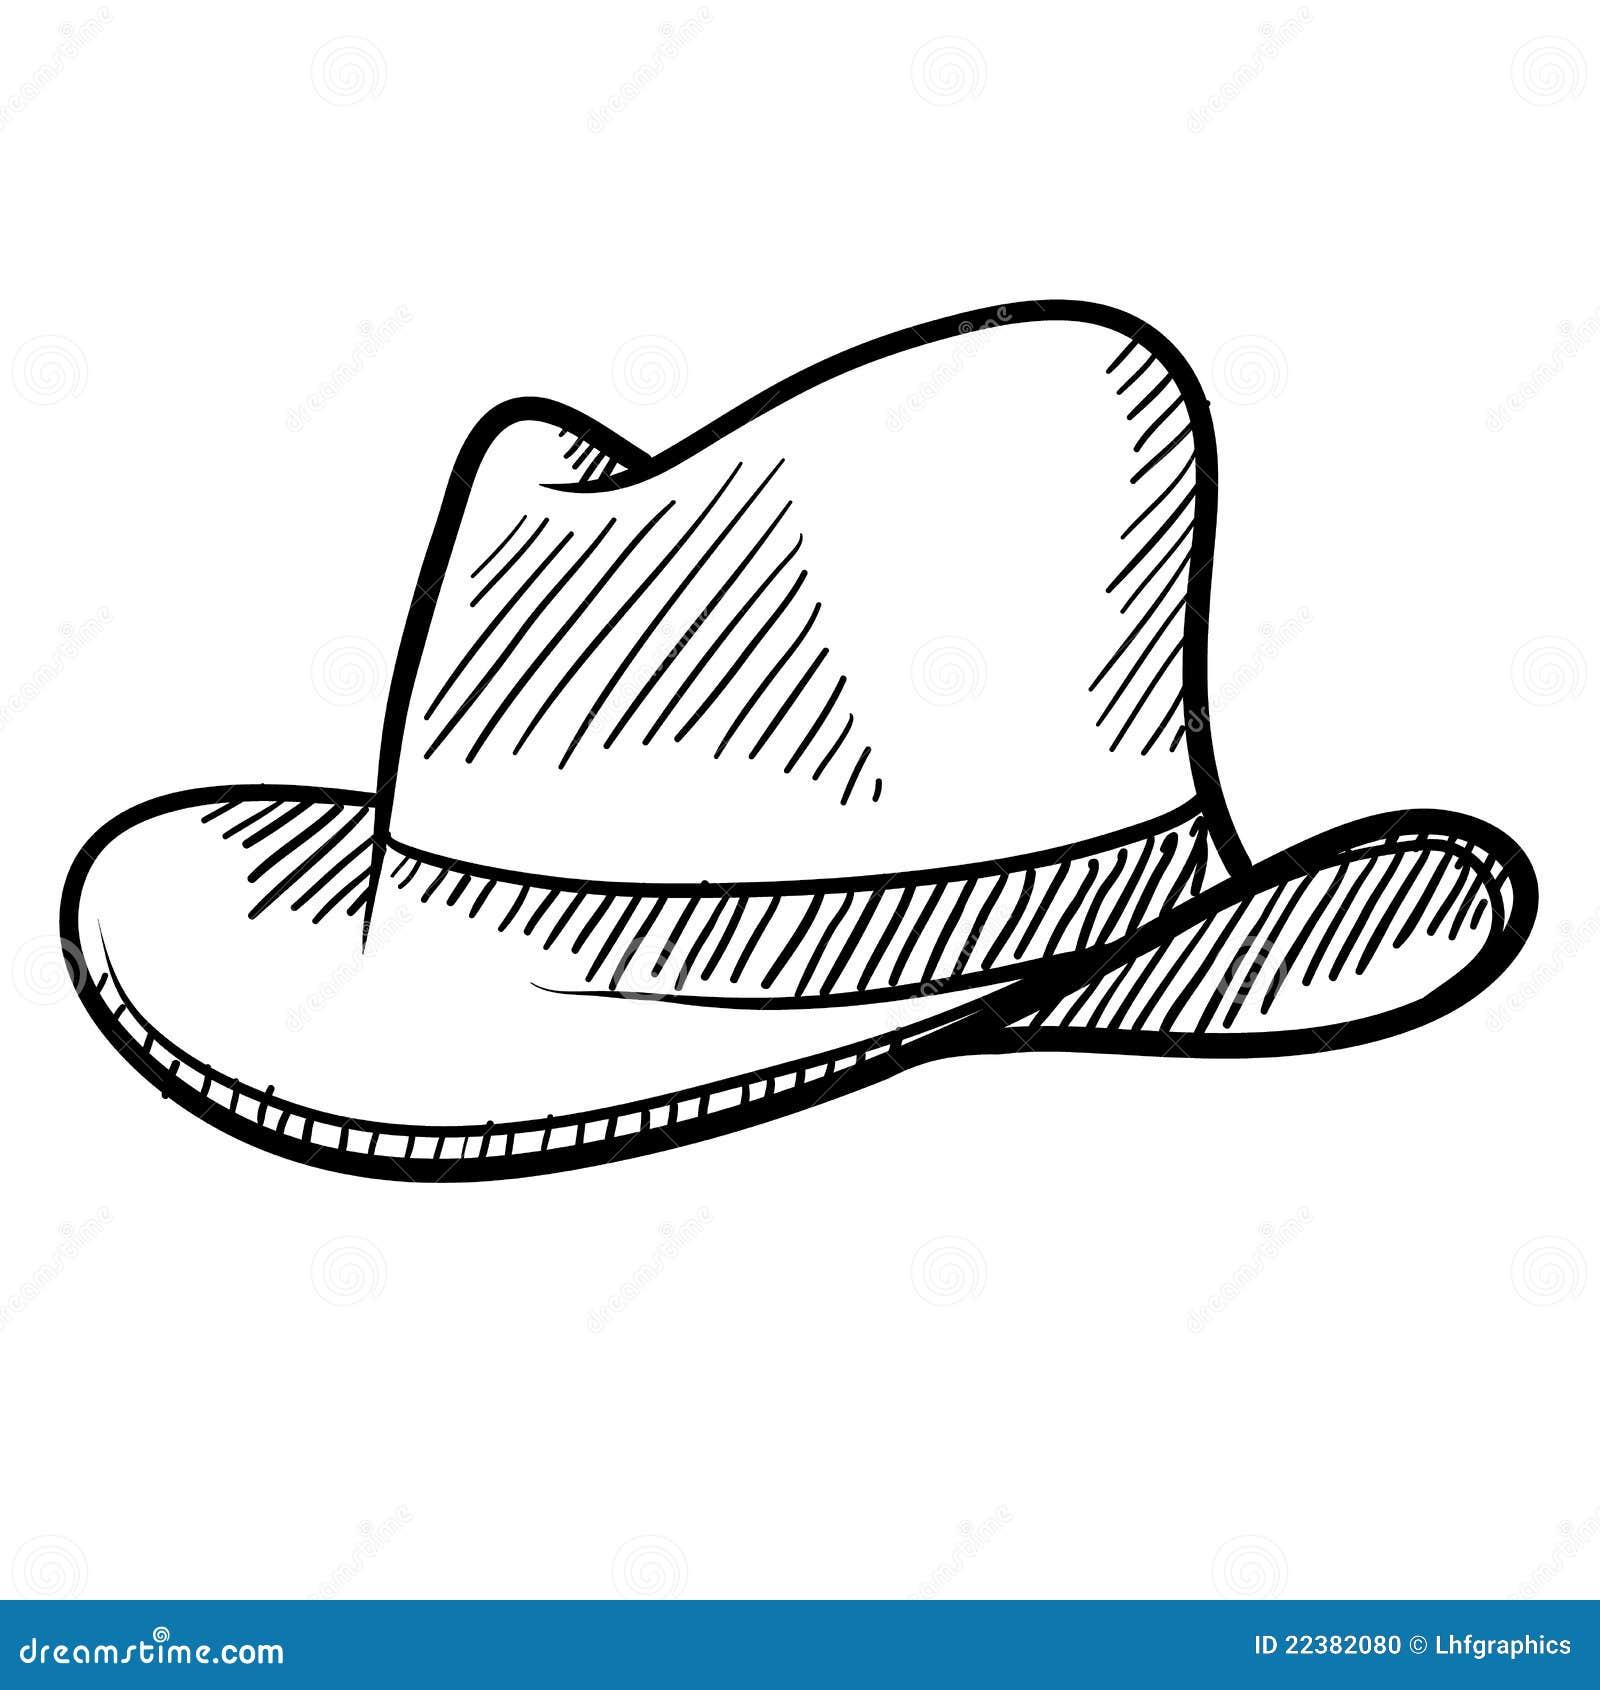 Cowboy Hat Sketch Stock Photo - Image: 22382080